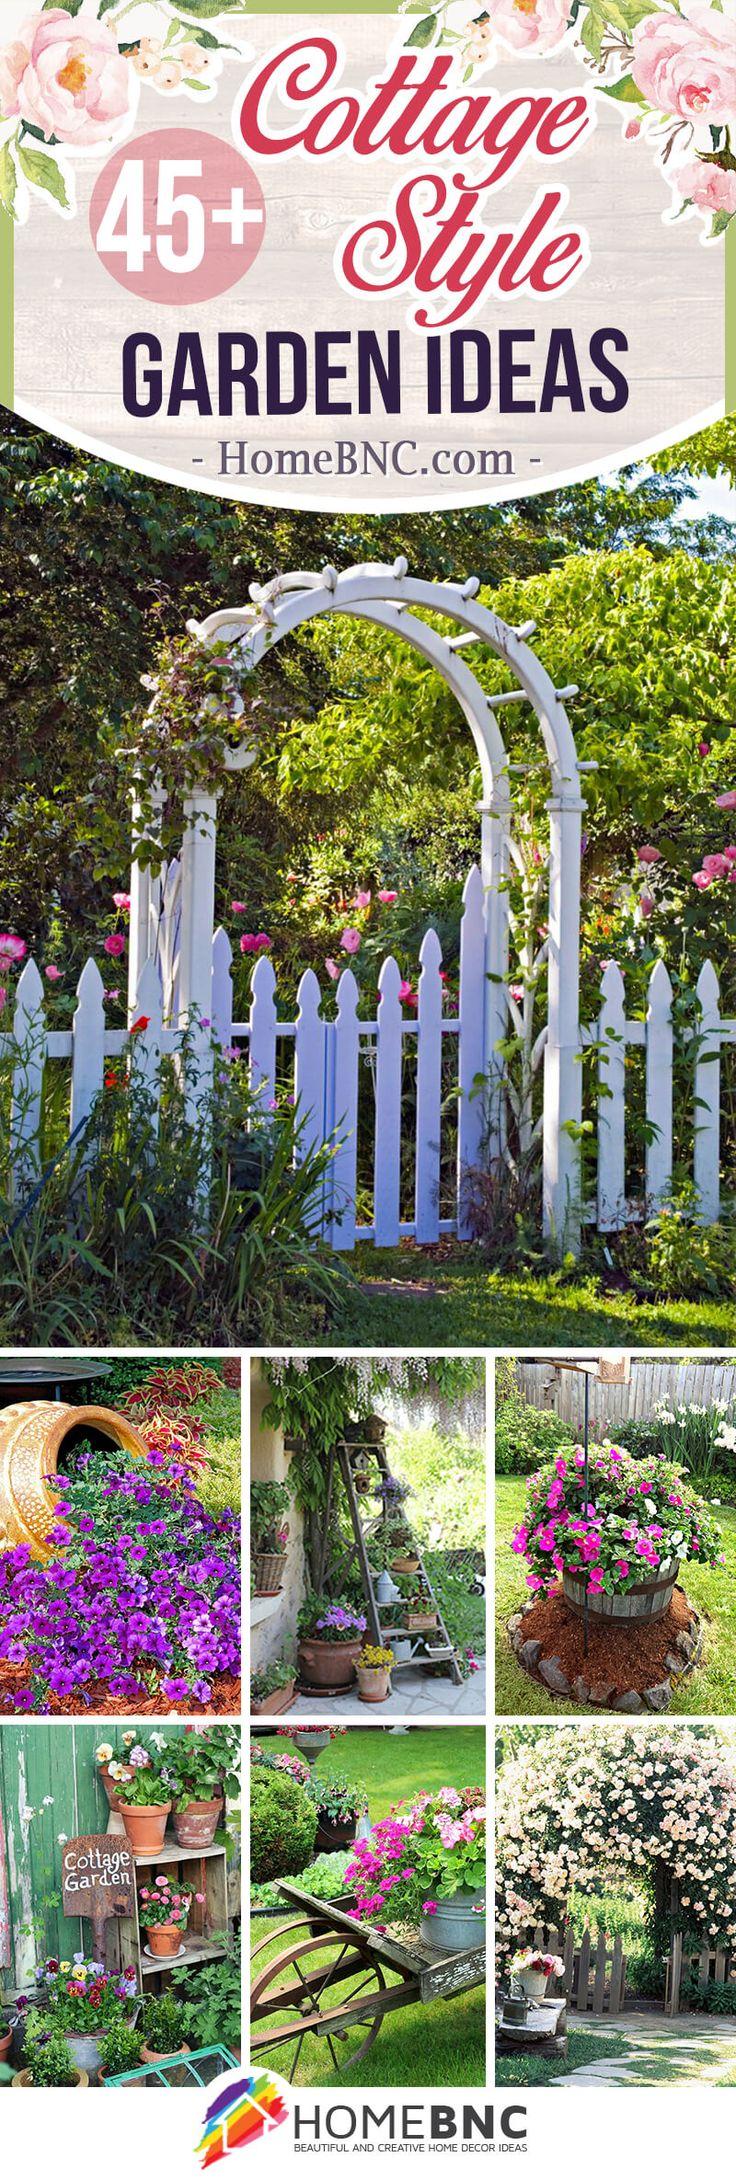 Cottage Style Garden Ideas #yard #landscaping #cottagestyle